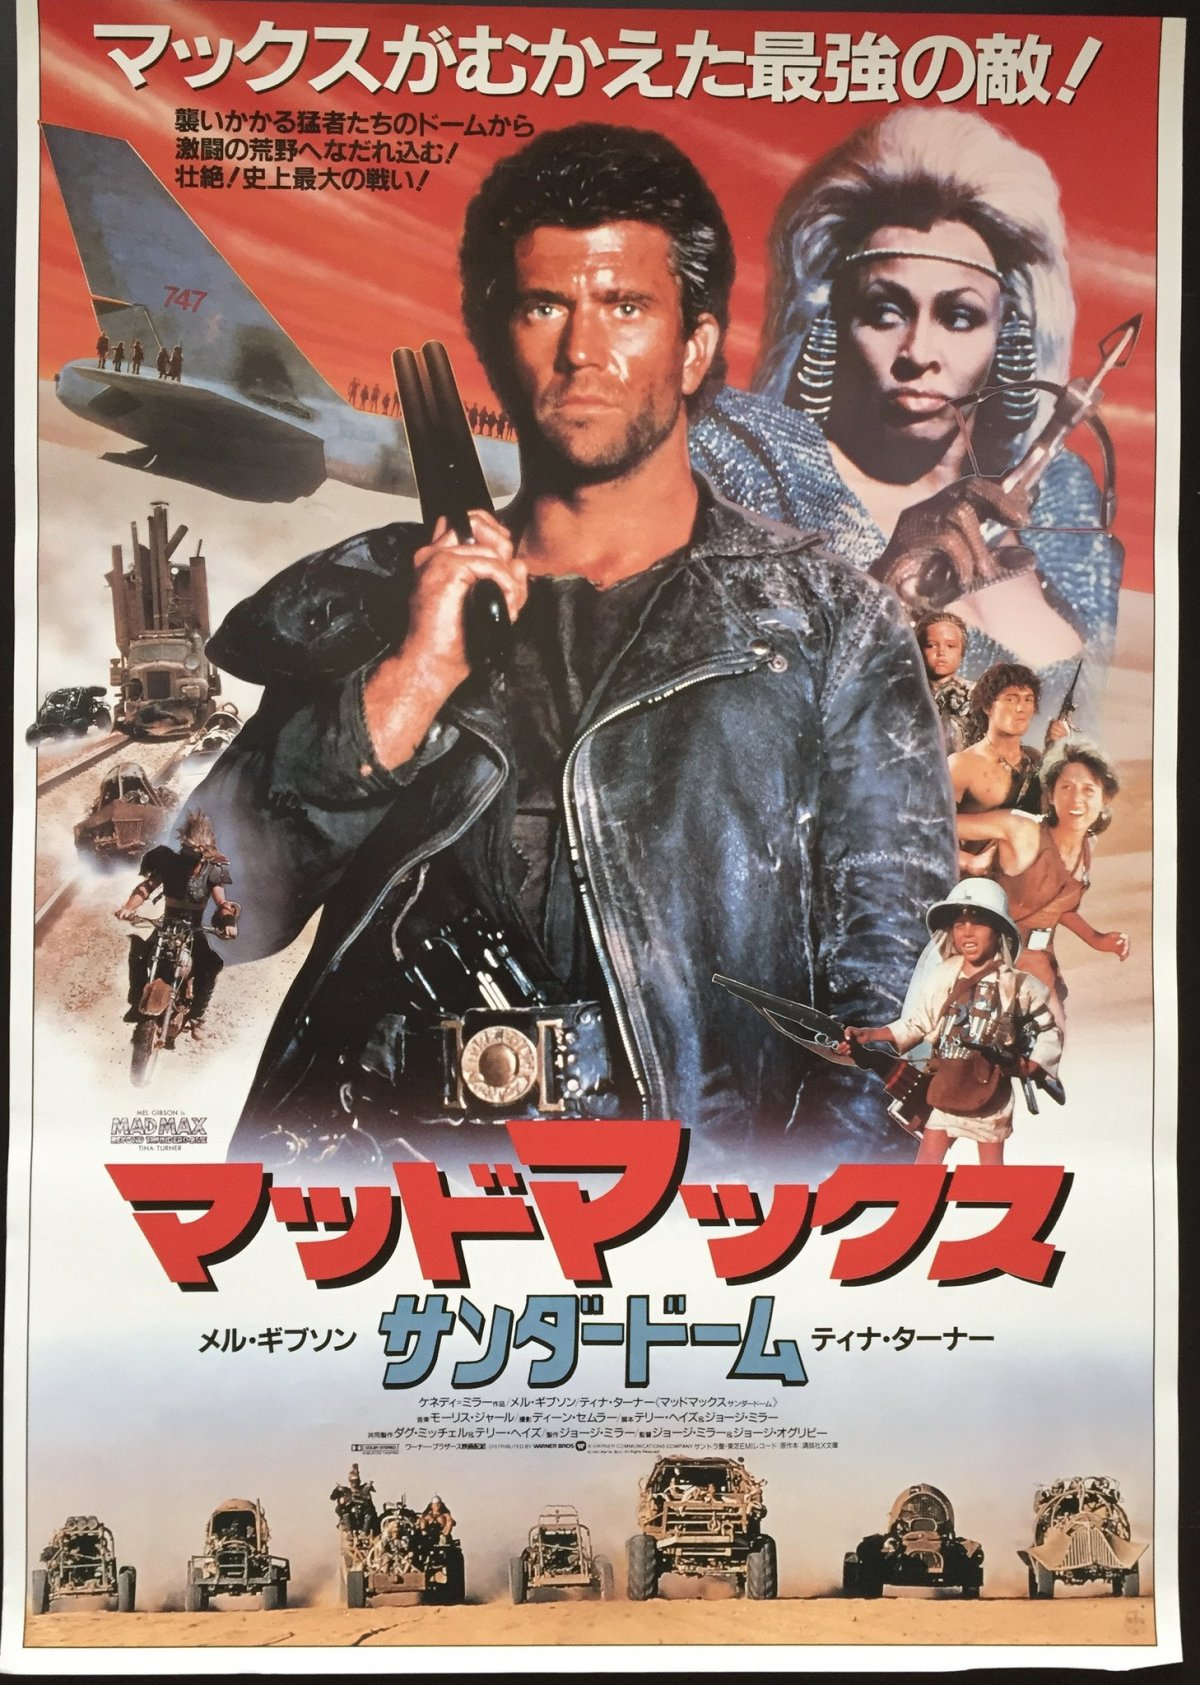 Mad Max: Beyond Thunderdome (1985, dir. George Miller & GeorgeOgilvy)